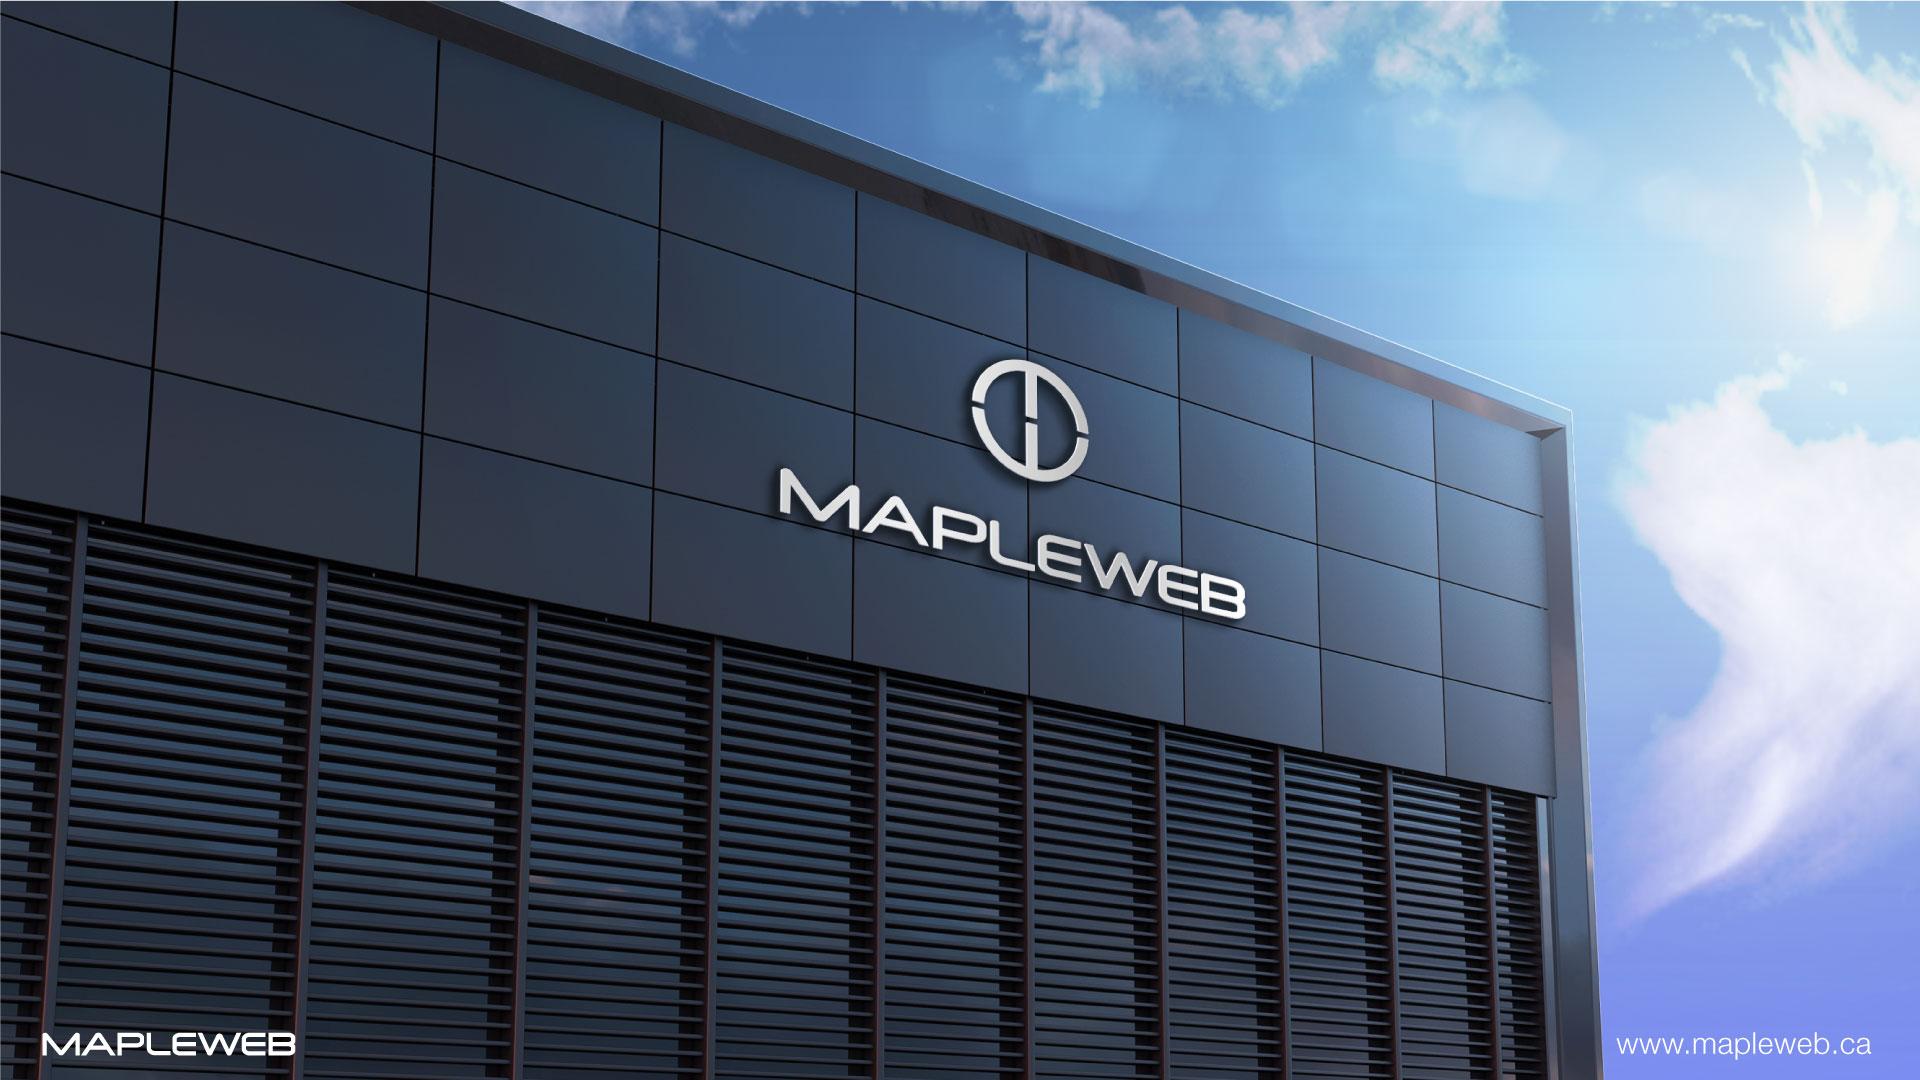 mapleweb-brand-logo-design-by-mapleweb-vancouver-canada-building-mock